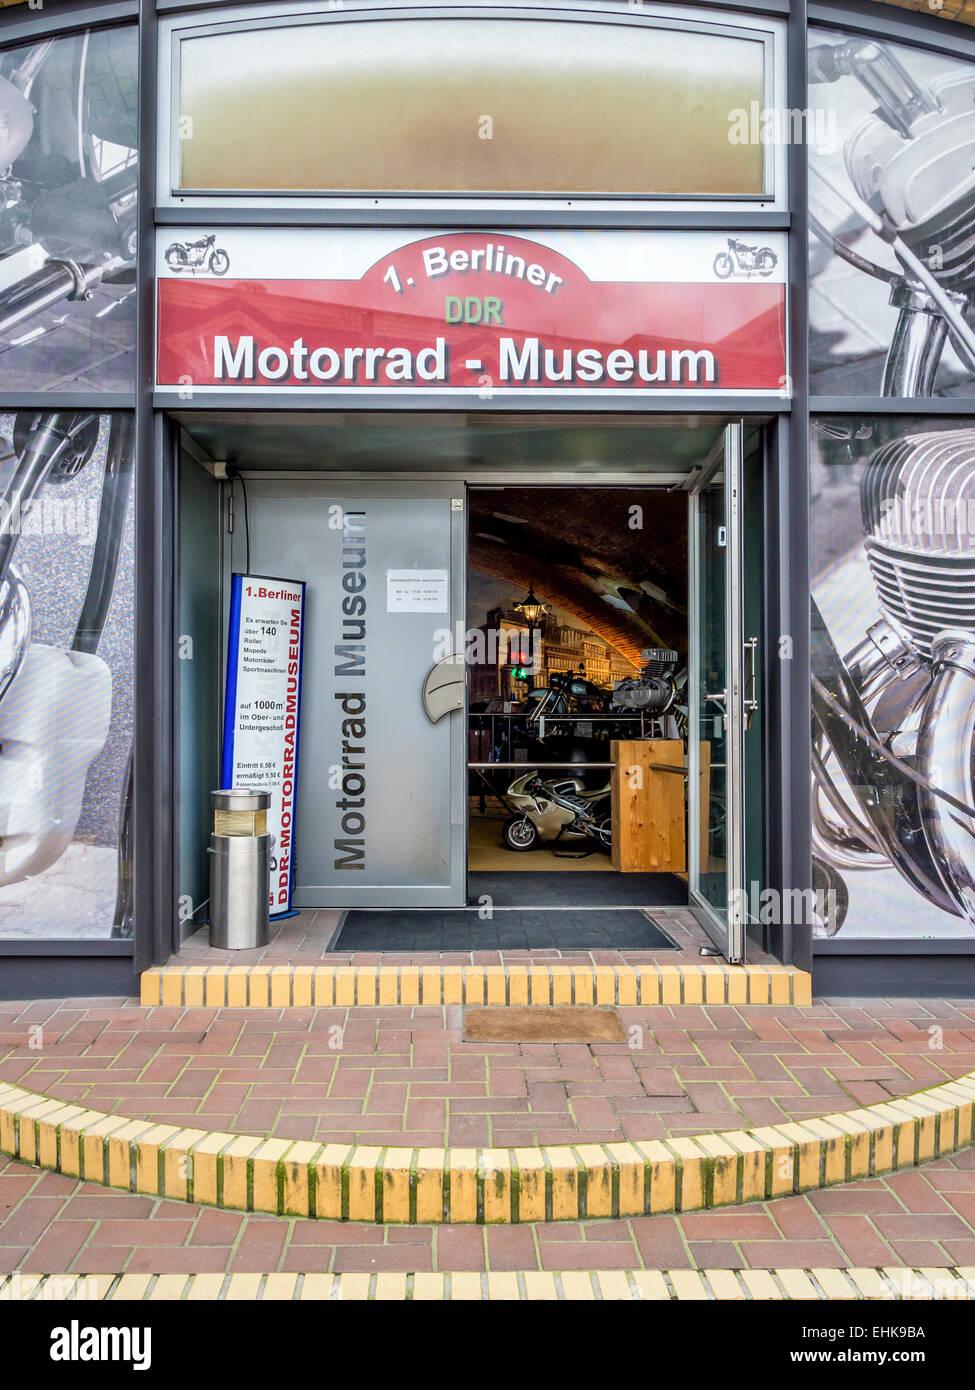 Berlin Motorrad DDR Motor bike museum exterior and entrance,Photographs outside, Mitte, Berlin - Stock Image